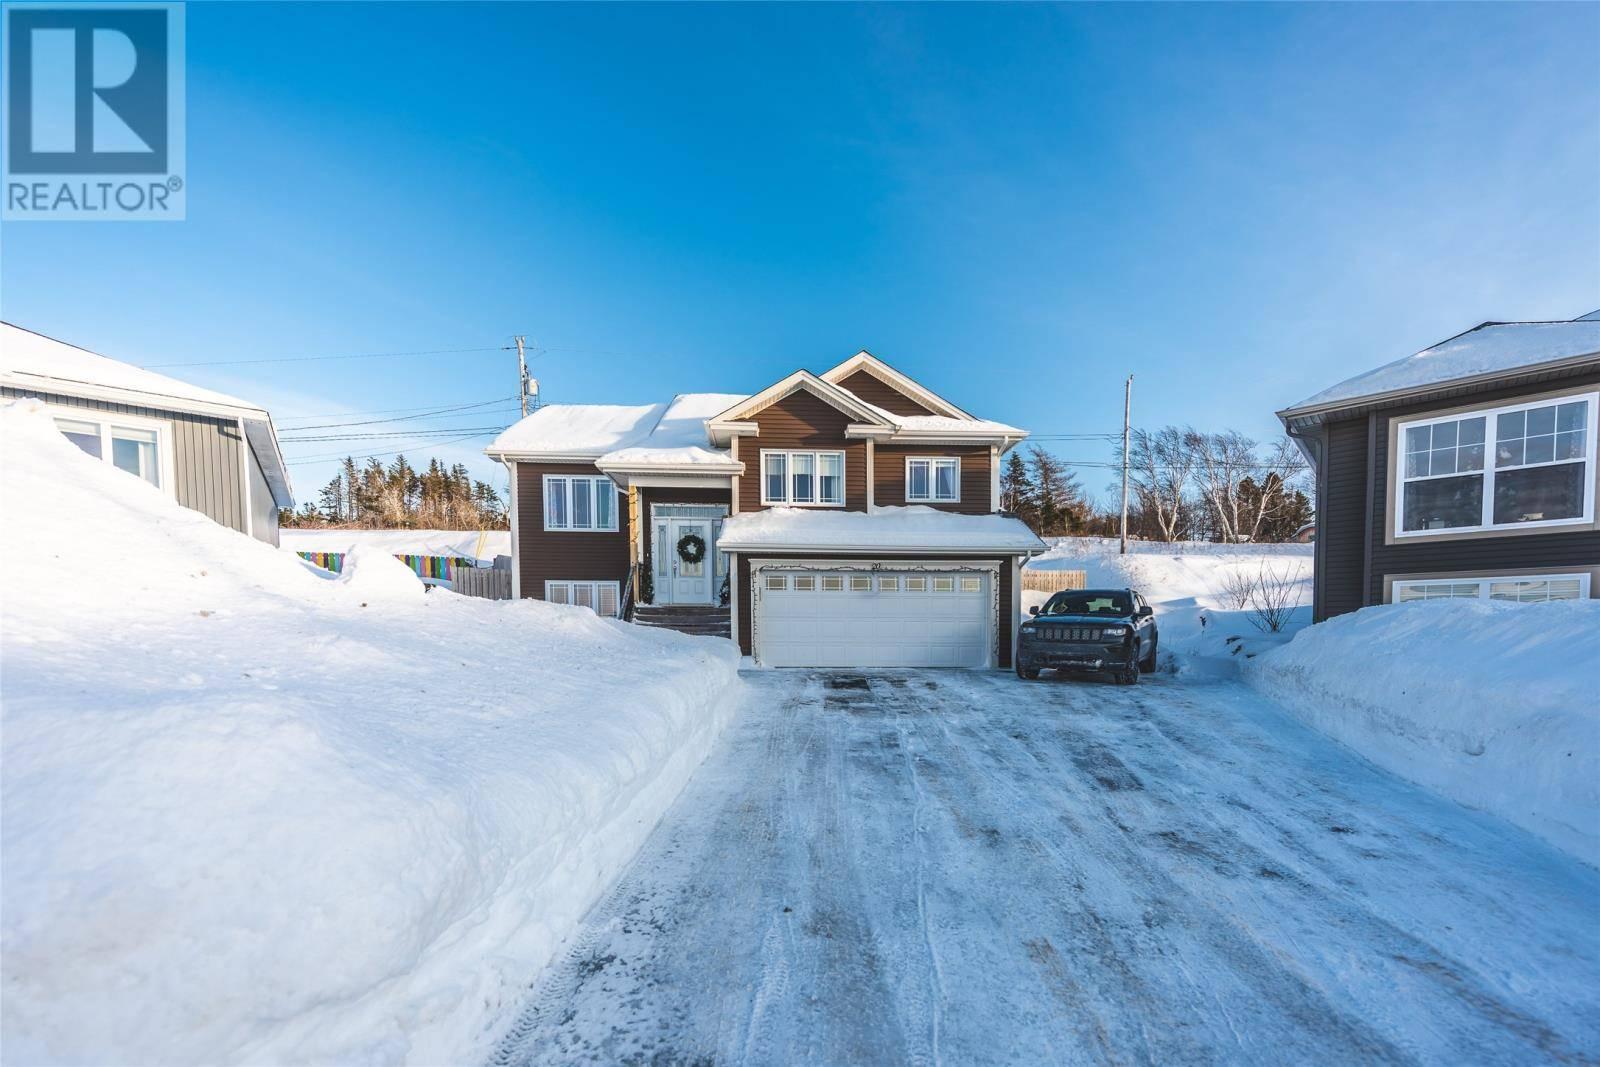 House for sale at 20 Gibbons Pl St. John's Newfoundland - MLS: 1209856